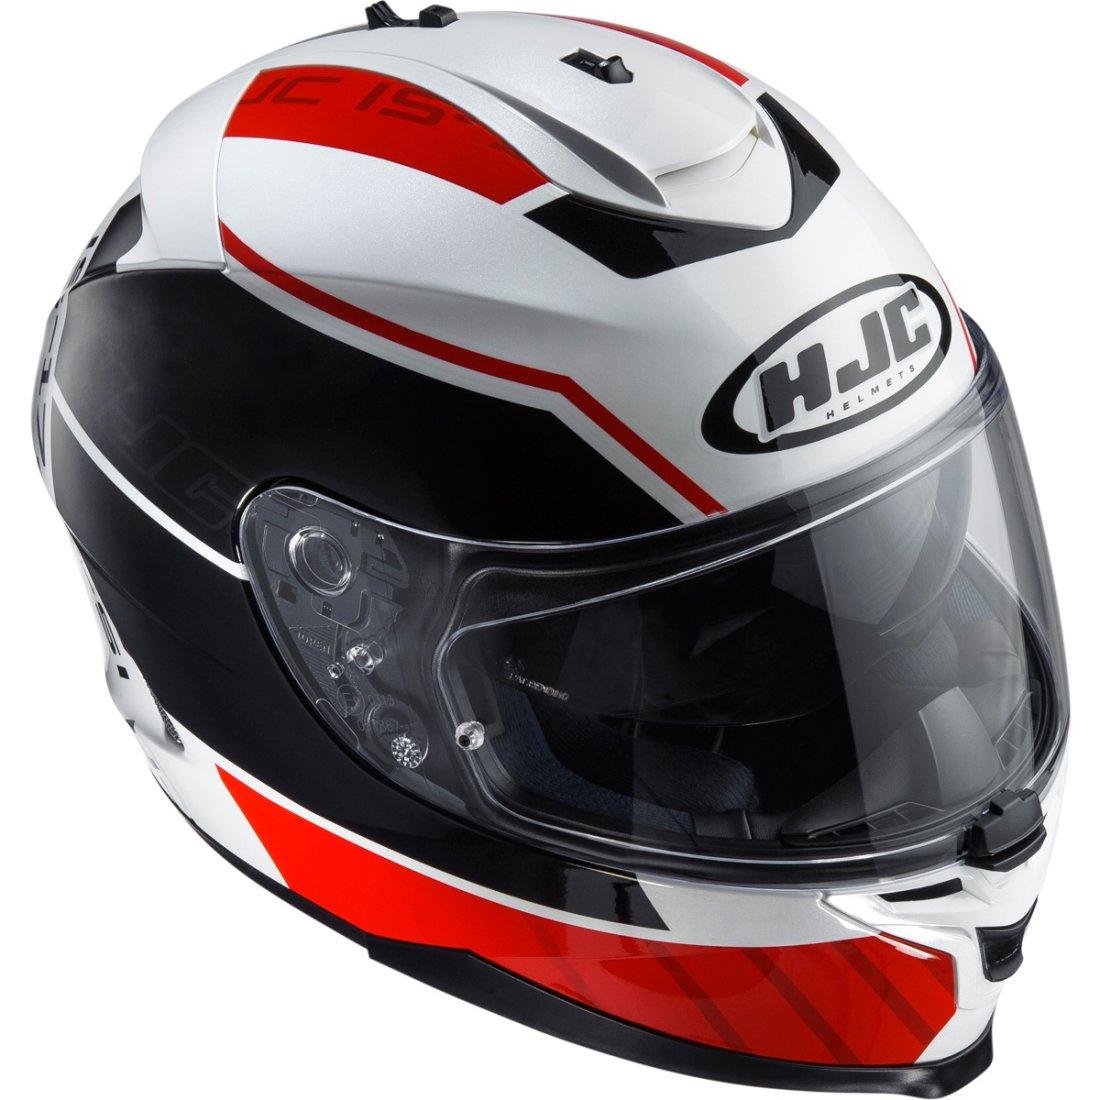 hjc is 17 tridents mc 1 helmet motocard. Black Bedroom Furniture Sets. Home Design Ideas